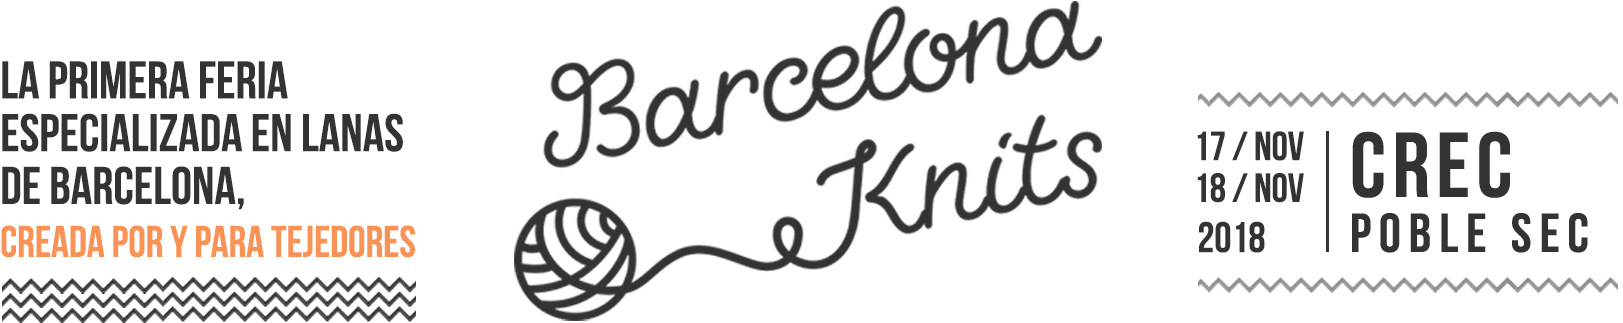 barcelona knits festival